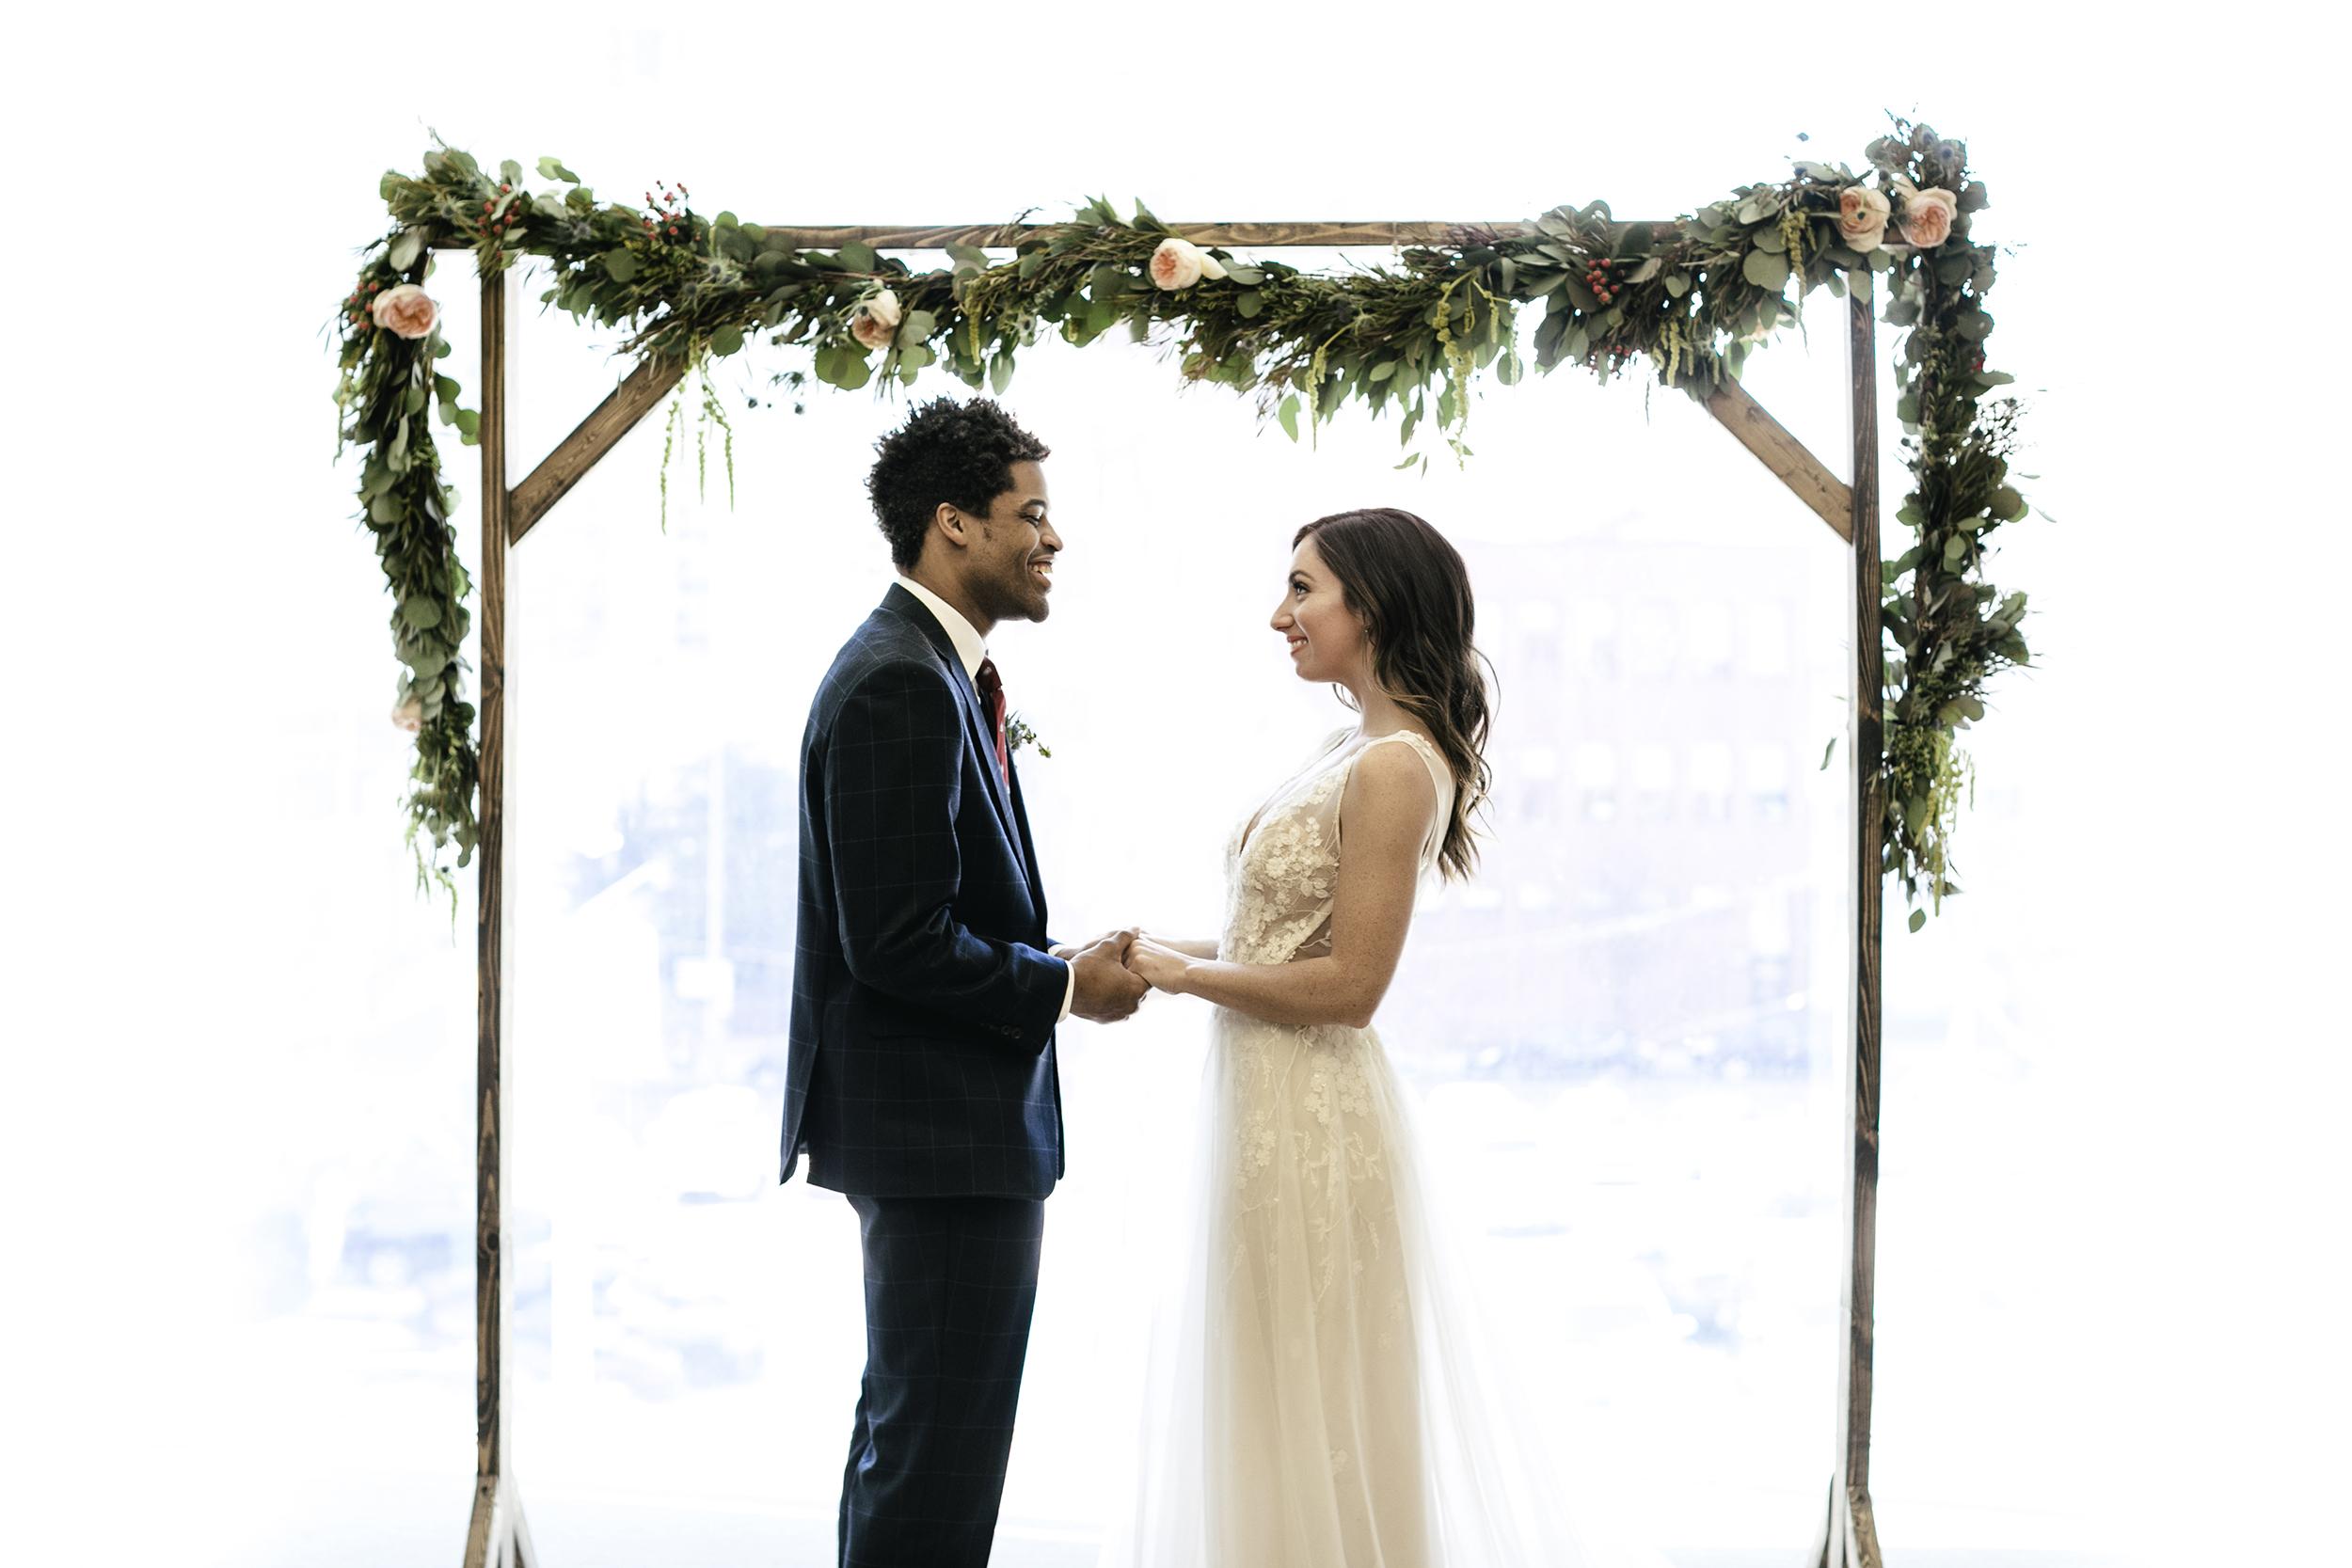 photography-wedding-weddings-natural-candid-pafa-pennsylvania academy-philadephia-philly-philadelphia wedding-mixed race-editorial-modern-fine-art-036.JPG